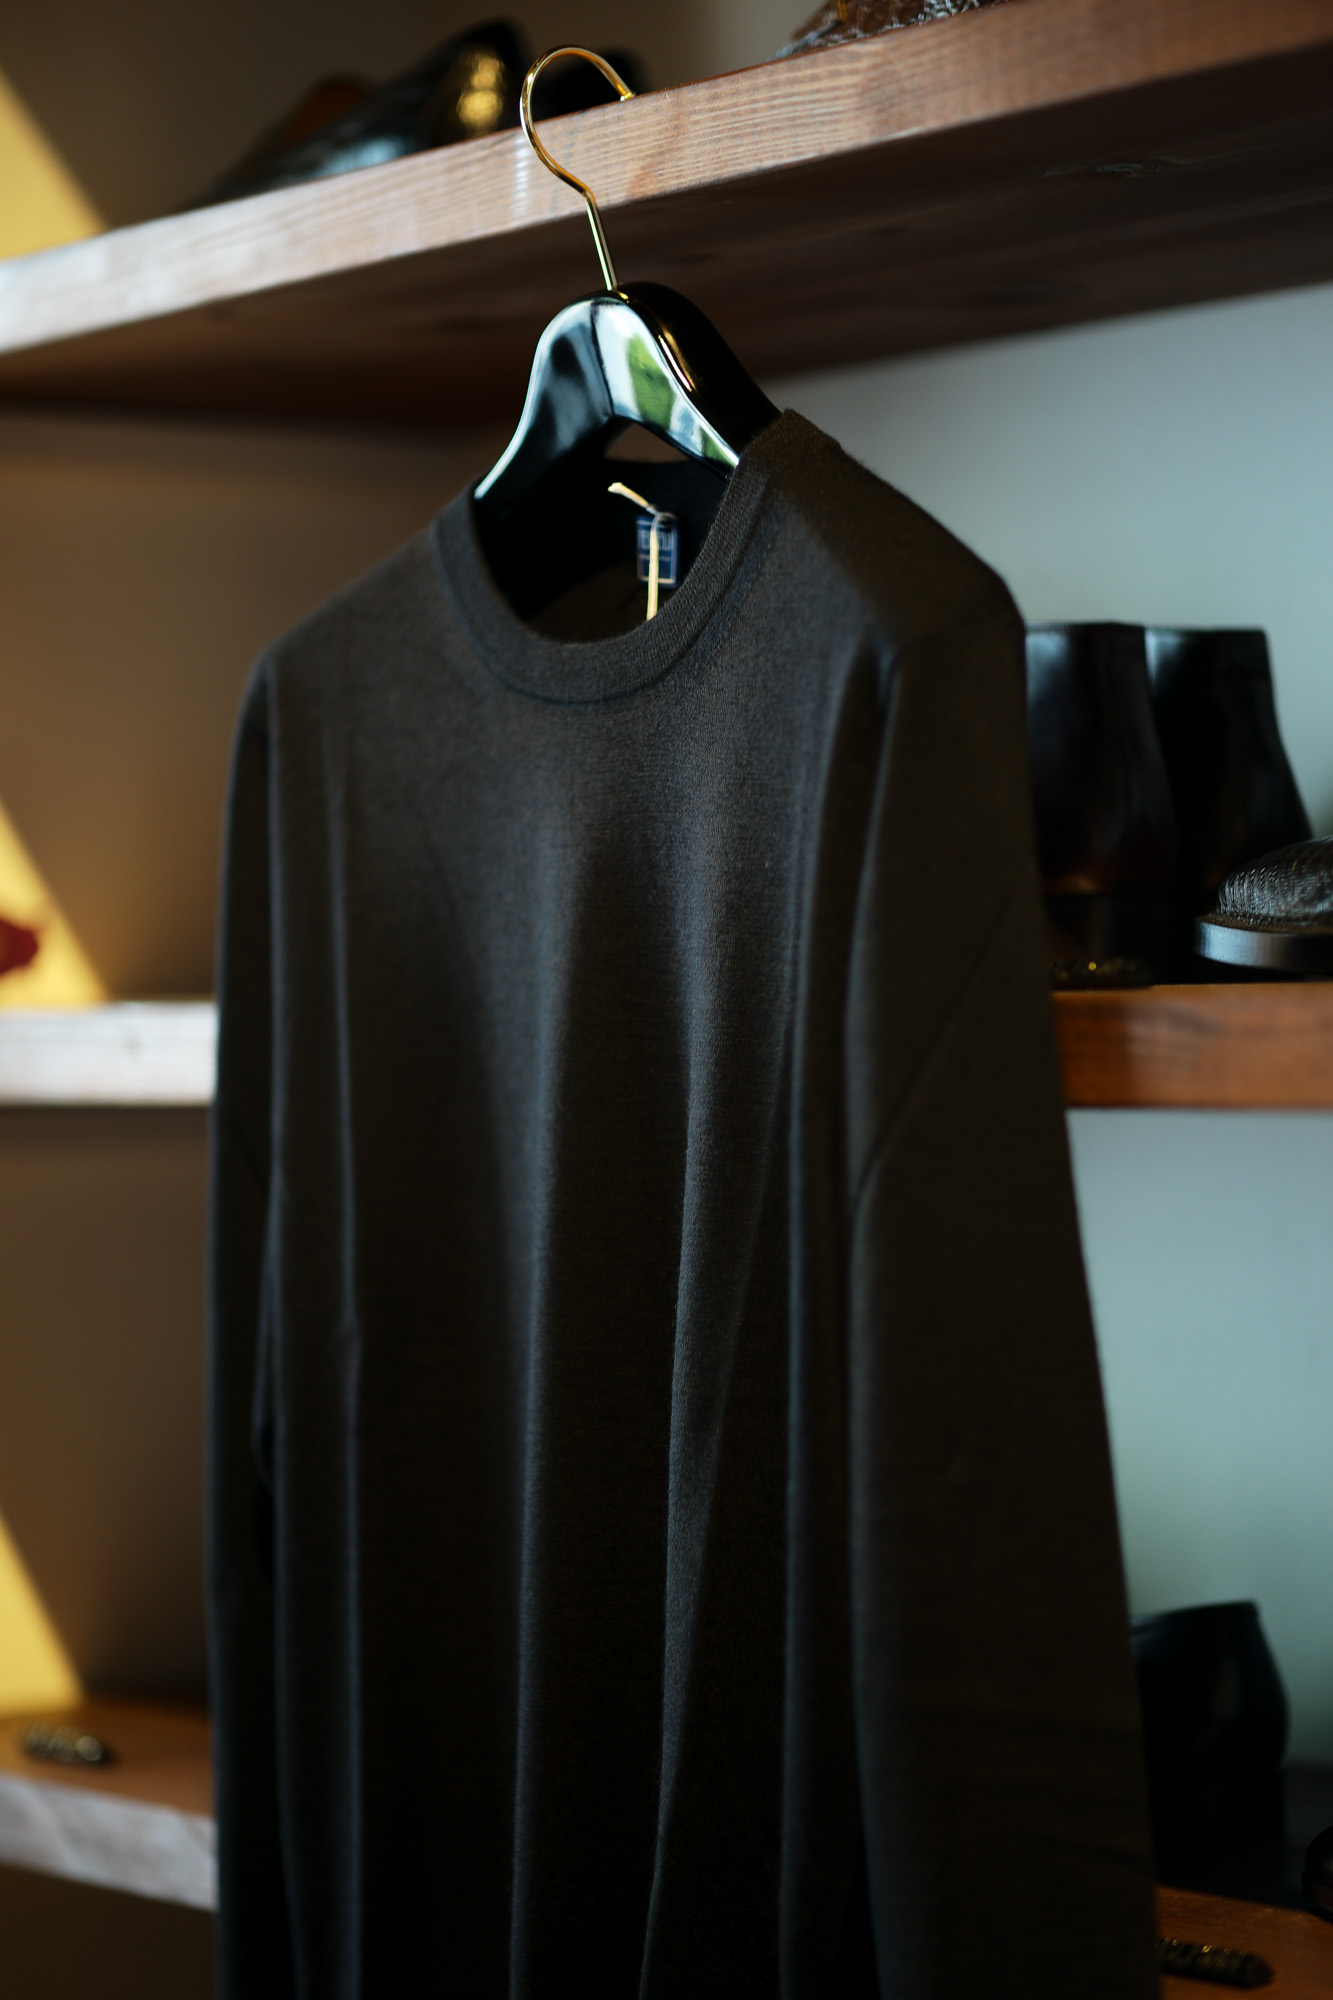 FEDELI (フェデリ) Silk Cashmere Crew Neck Sweater シルクカシミア クルーネック セーター BLACK (ブラック・9)made in italy (イタリア製) 2021 秋冬新作 【入荷しました】【フリー分発売開始】愛知 名古屋 Alto e Diritto altoediritto アルトエデリット シルカシニット